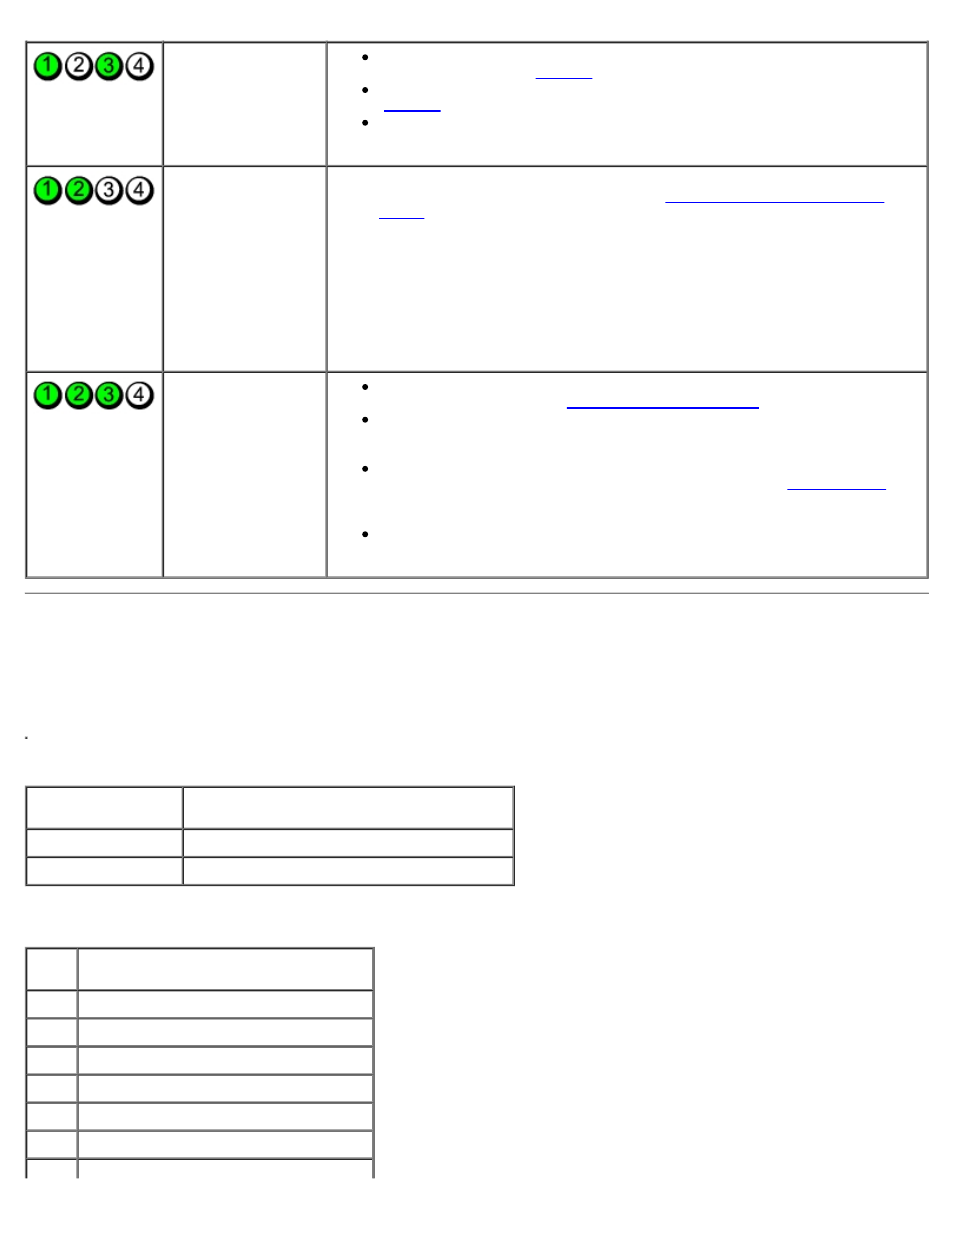 beep codes dell xps 710 user manual page 67 88 original mode rh manualsdir com dell xps 13 user manual dell xps 15 service manual